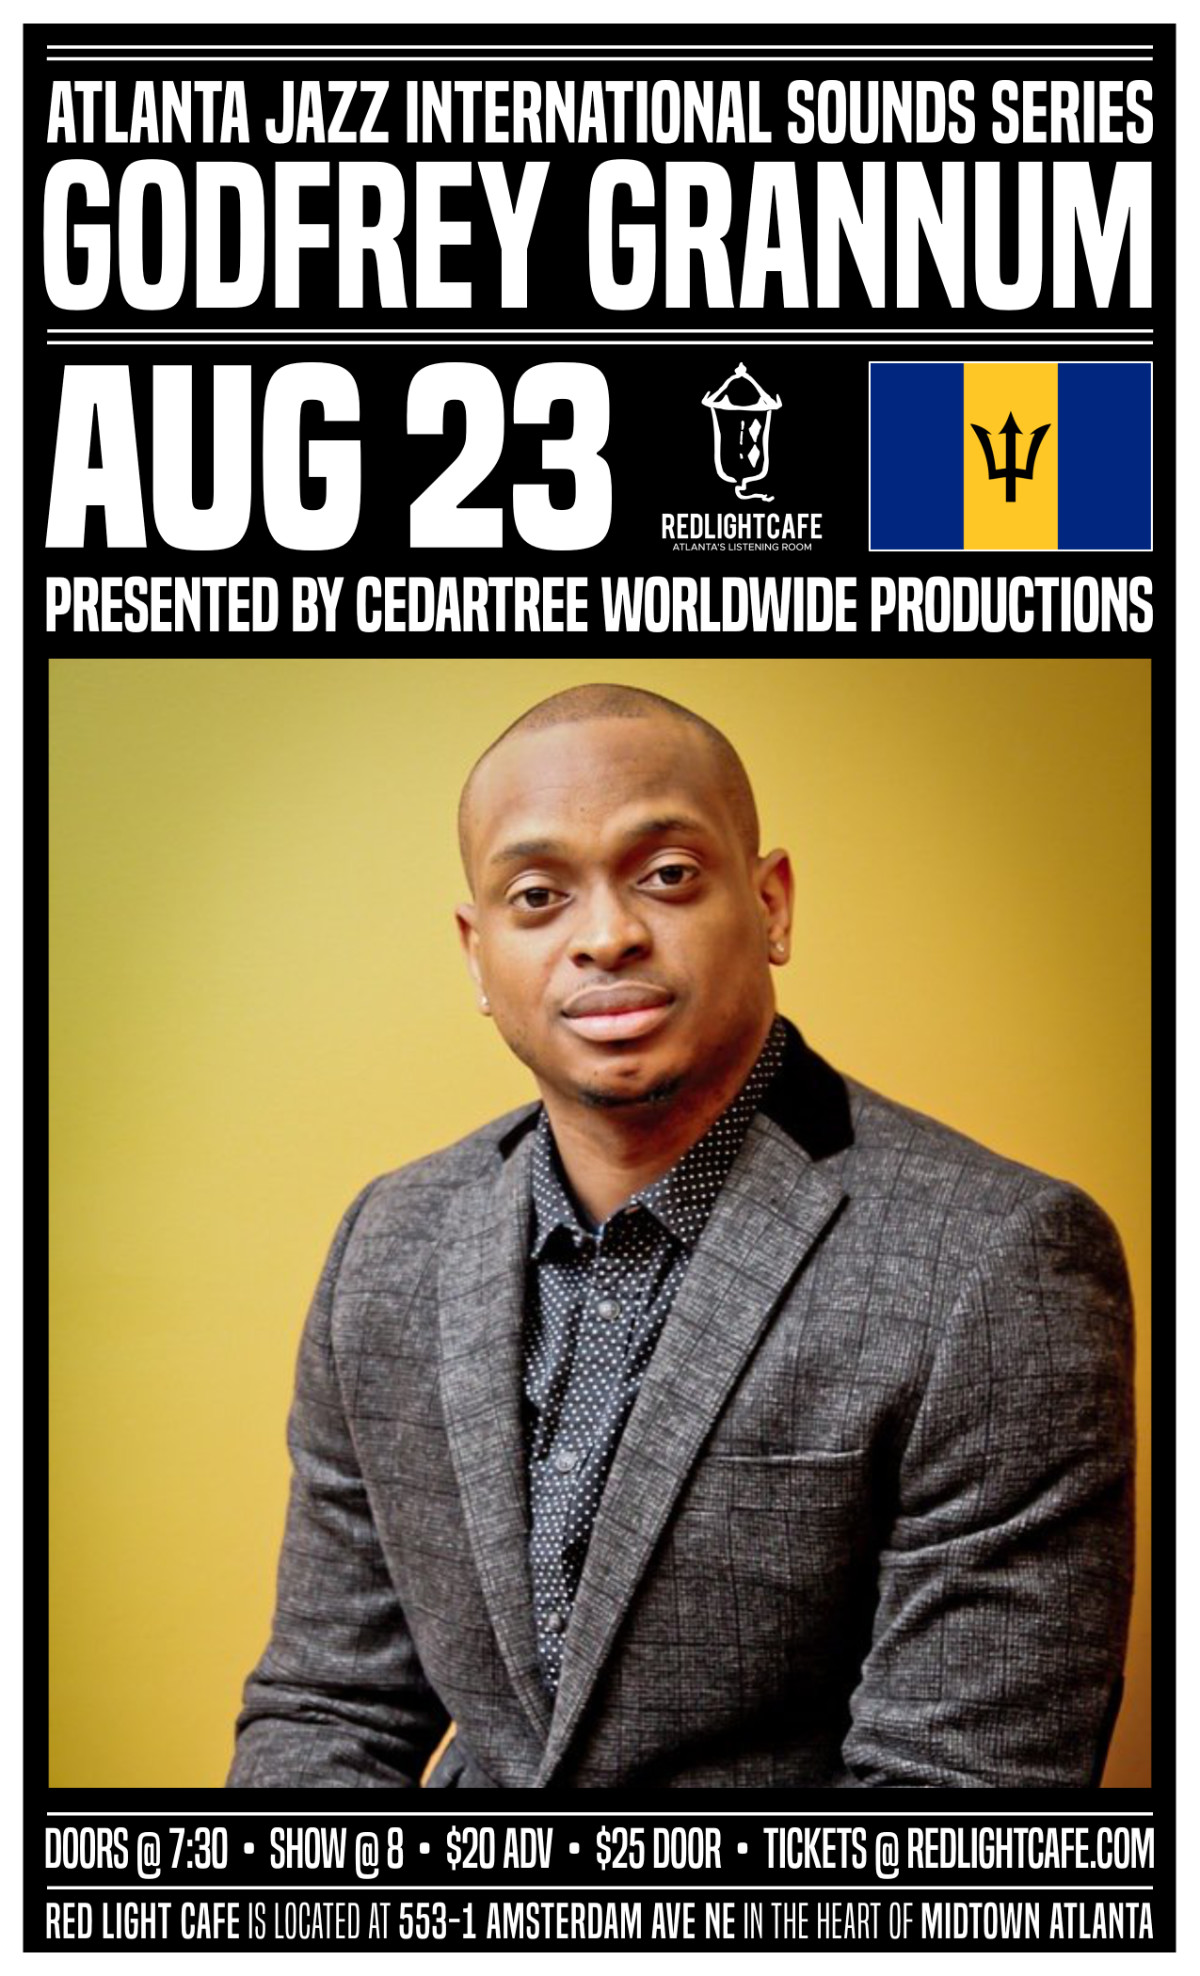 Atlanta Jazz International Sounds Series: Godfrey Grannum — August 23, 2019 — Red Light Café, Atlanta, GA